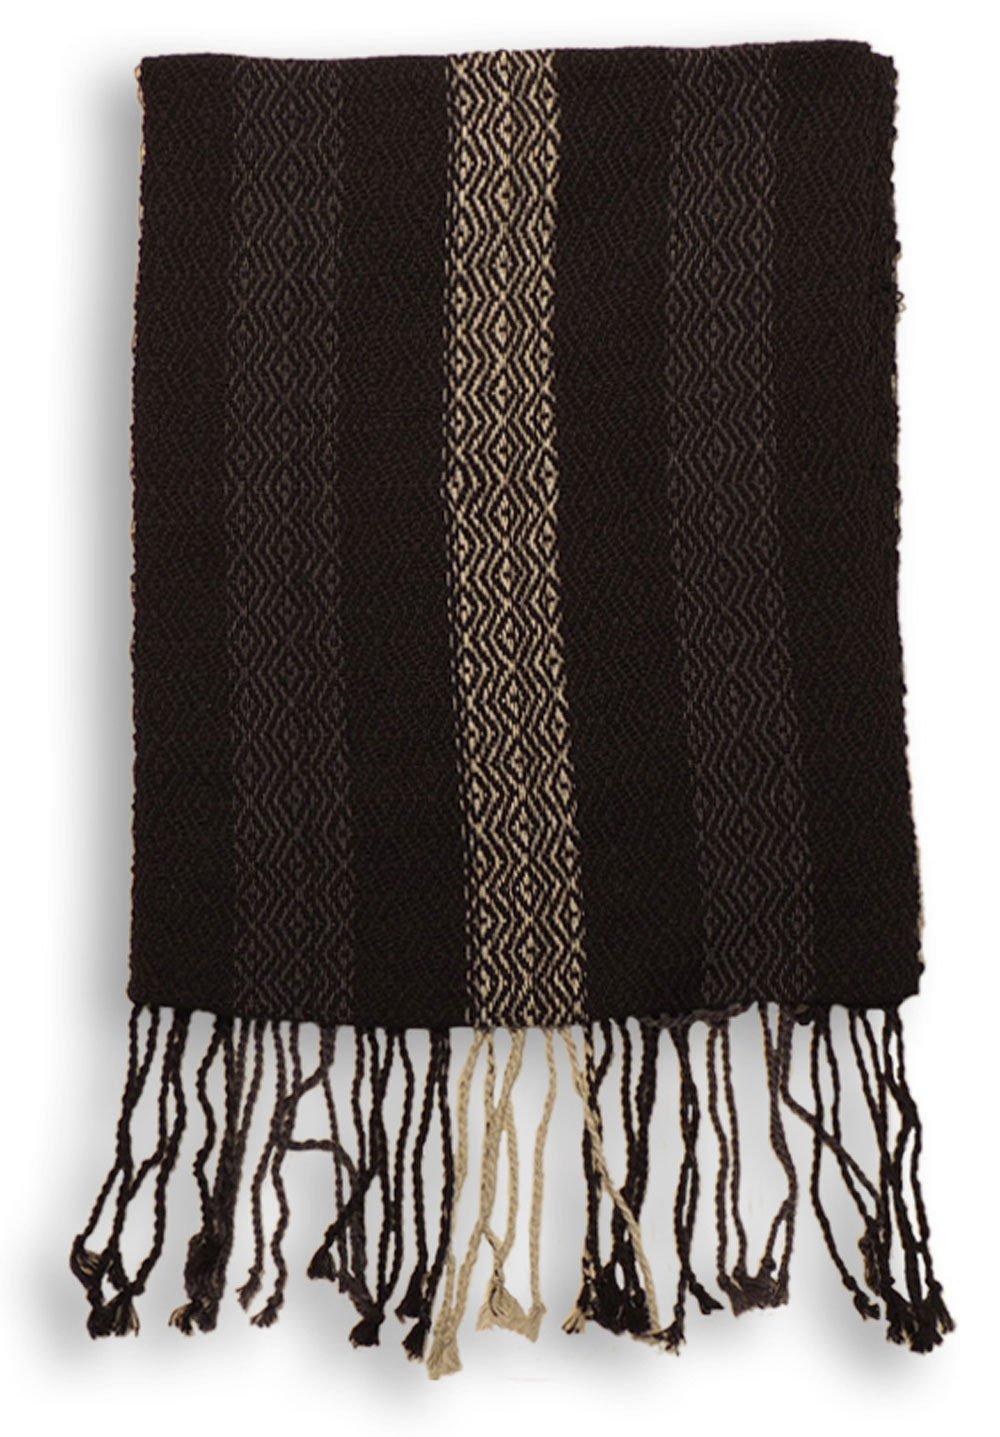 #4417 Hand Loomed Striped Alpaca Scarf Two Pack Assortment Artisan Peru Designer by Sanyork Fair Trade (Image #5)